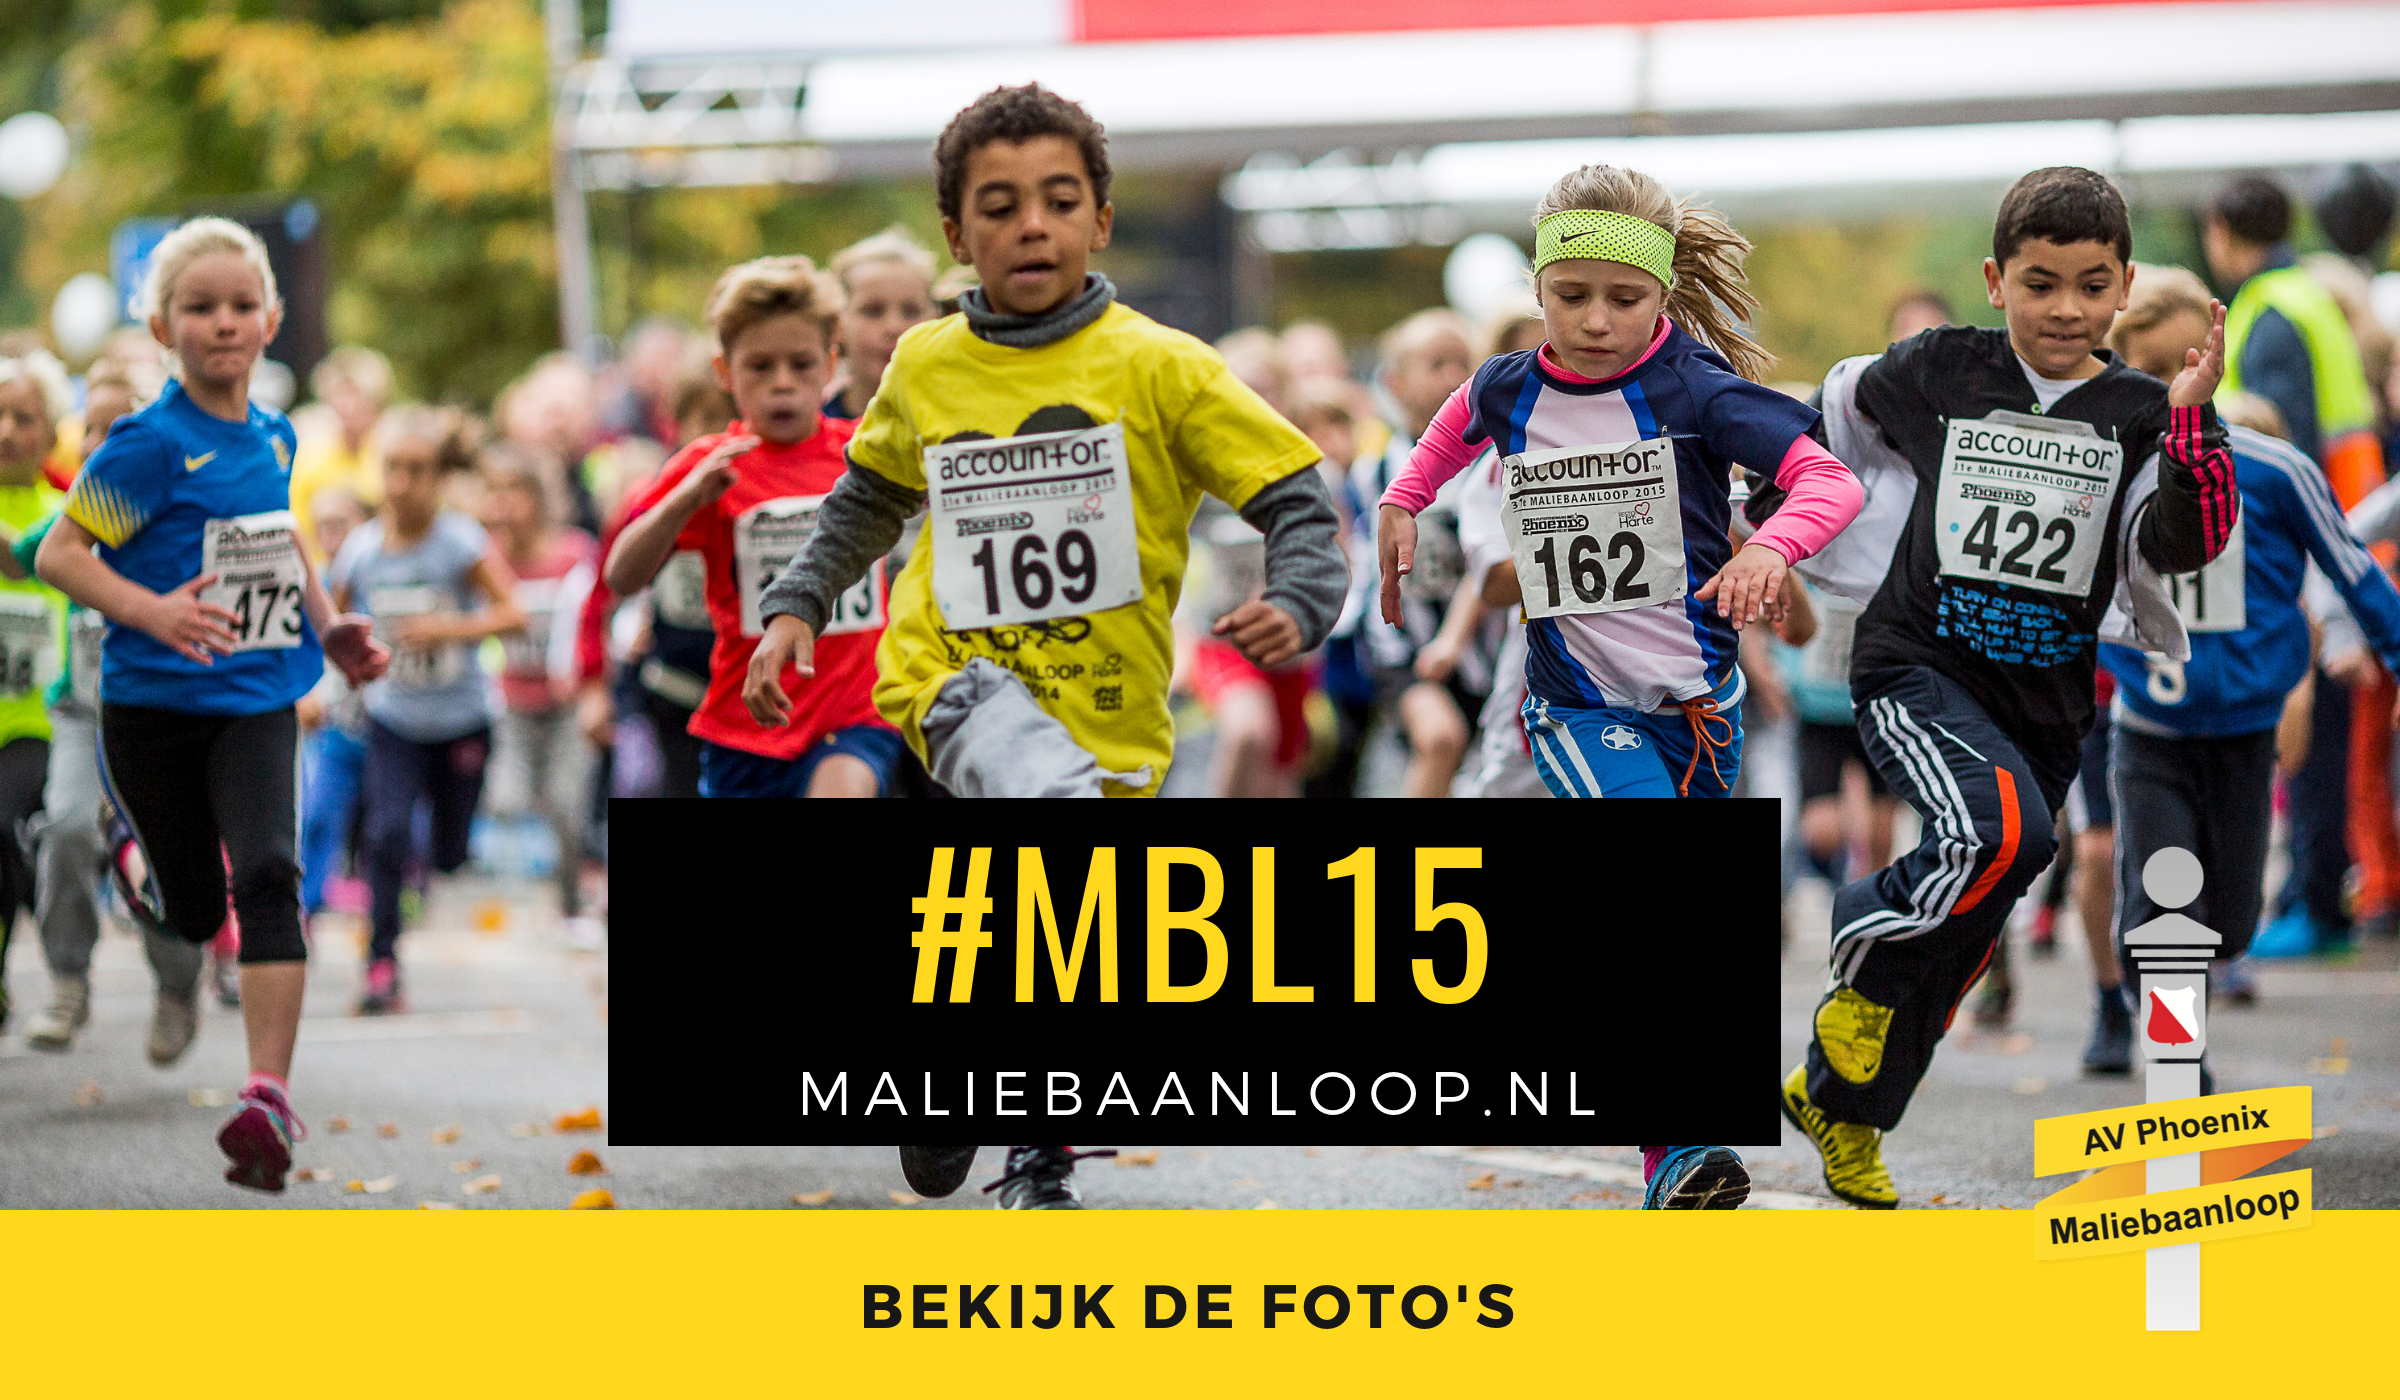 Foto's 31e Accountor Maliebaanloop 2015